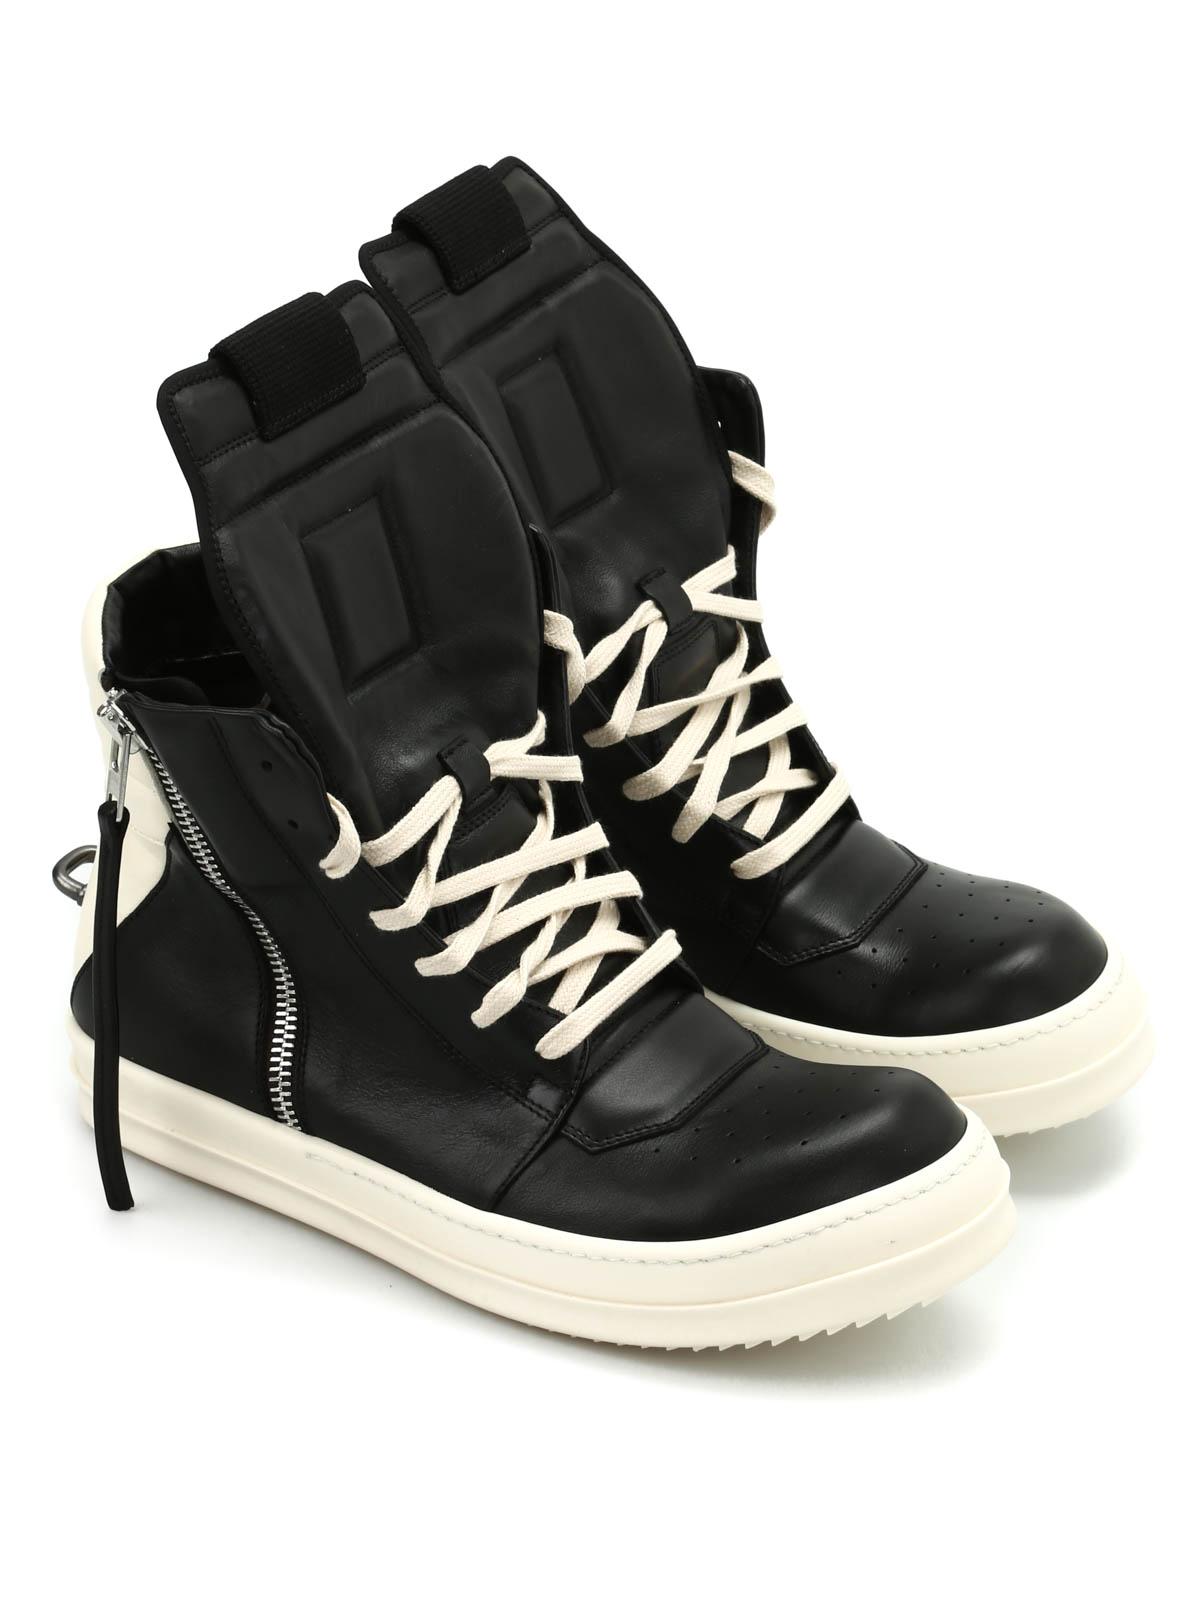 geobasket sneakers by rick owens trainers ikrix. Black Bedroom Furniture Sets. Home Design Ideas